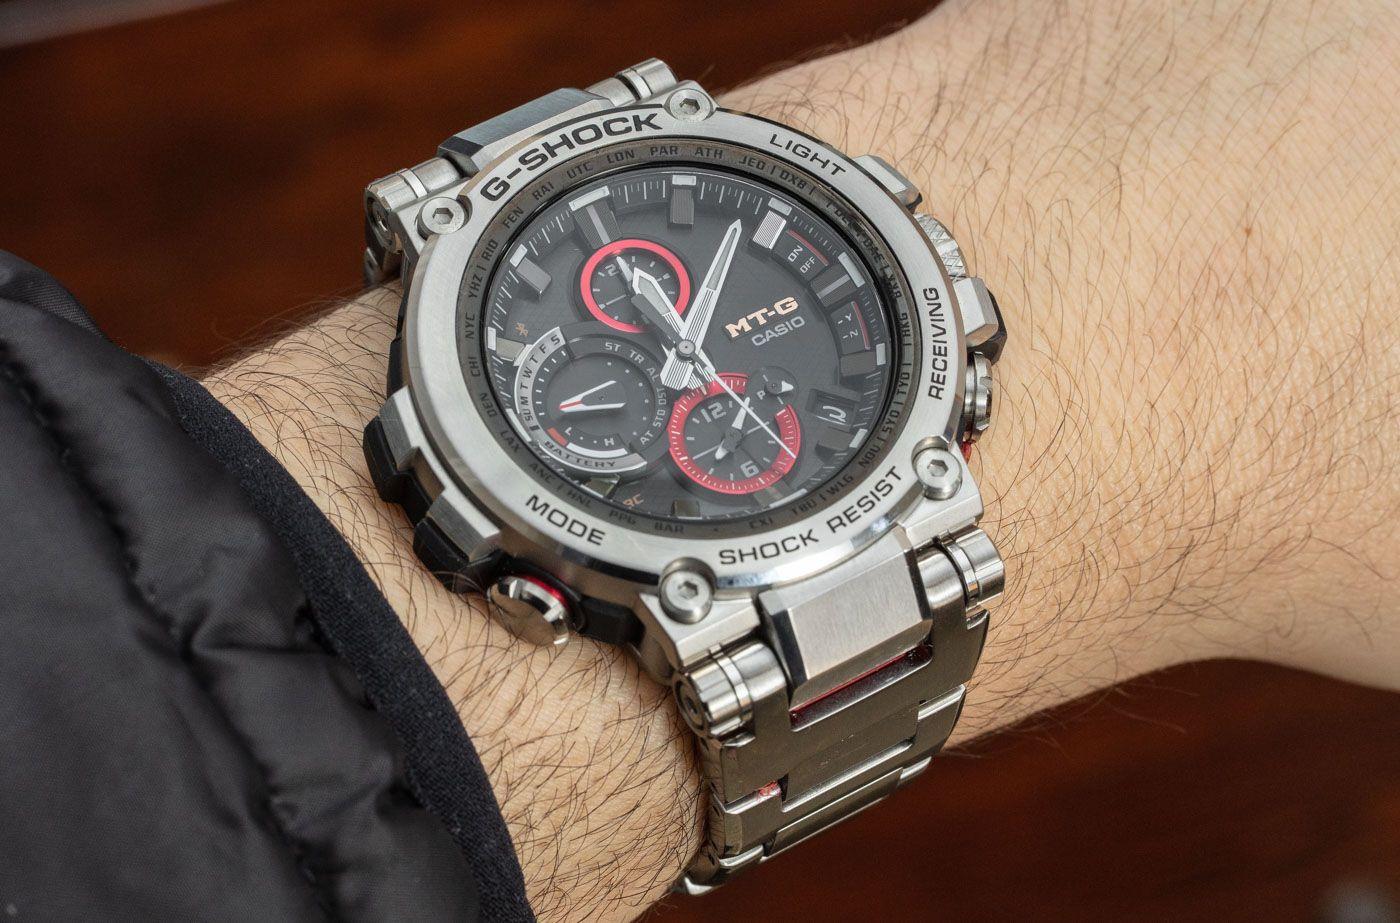 Casio G Shock Mt G Mtgb1000d 1a Watch Evaluate Steel With Fashionable Maturity Casio G Shock G Shock Casio G Shock Watches